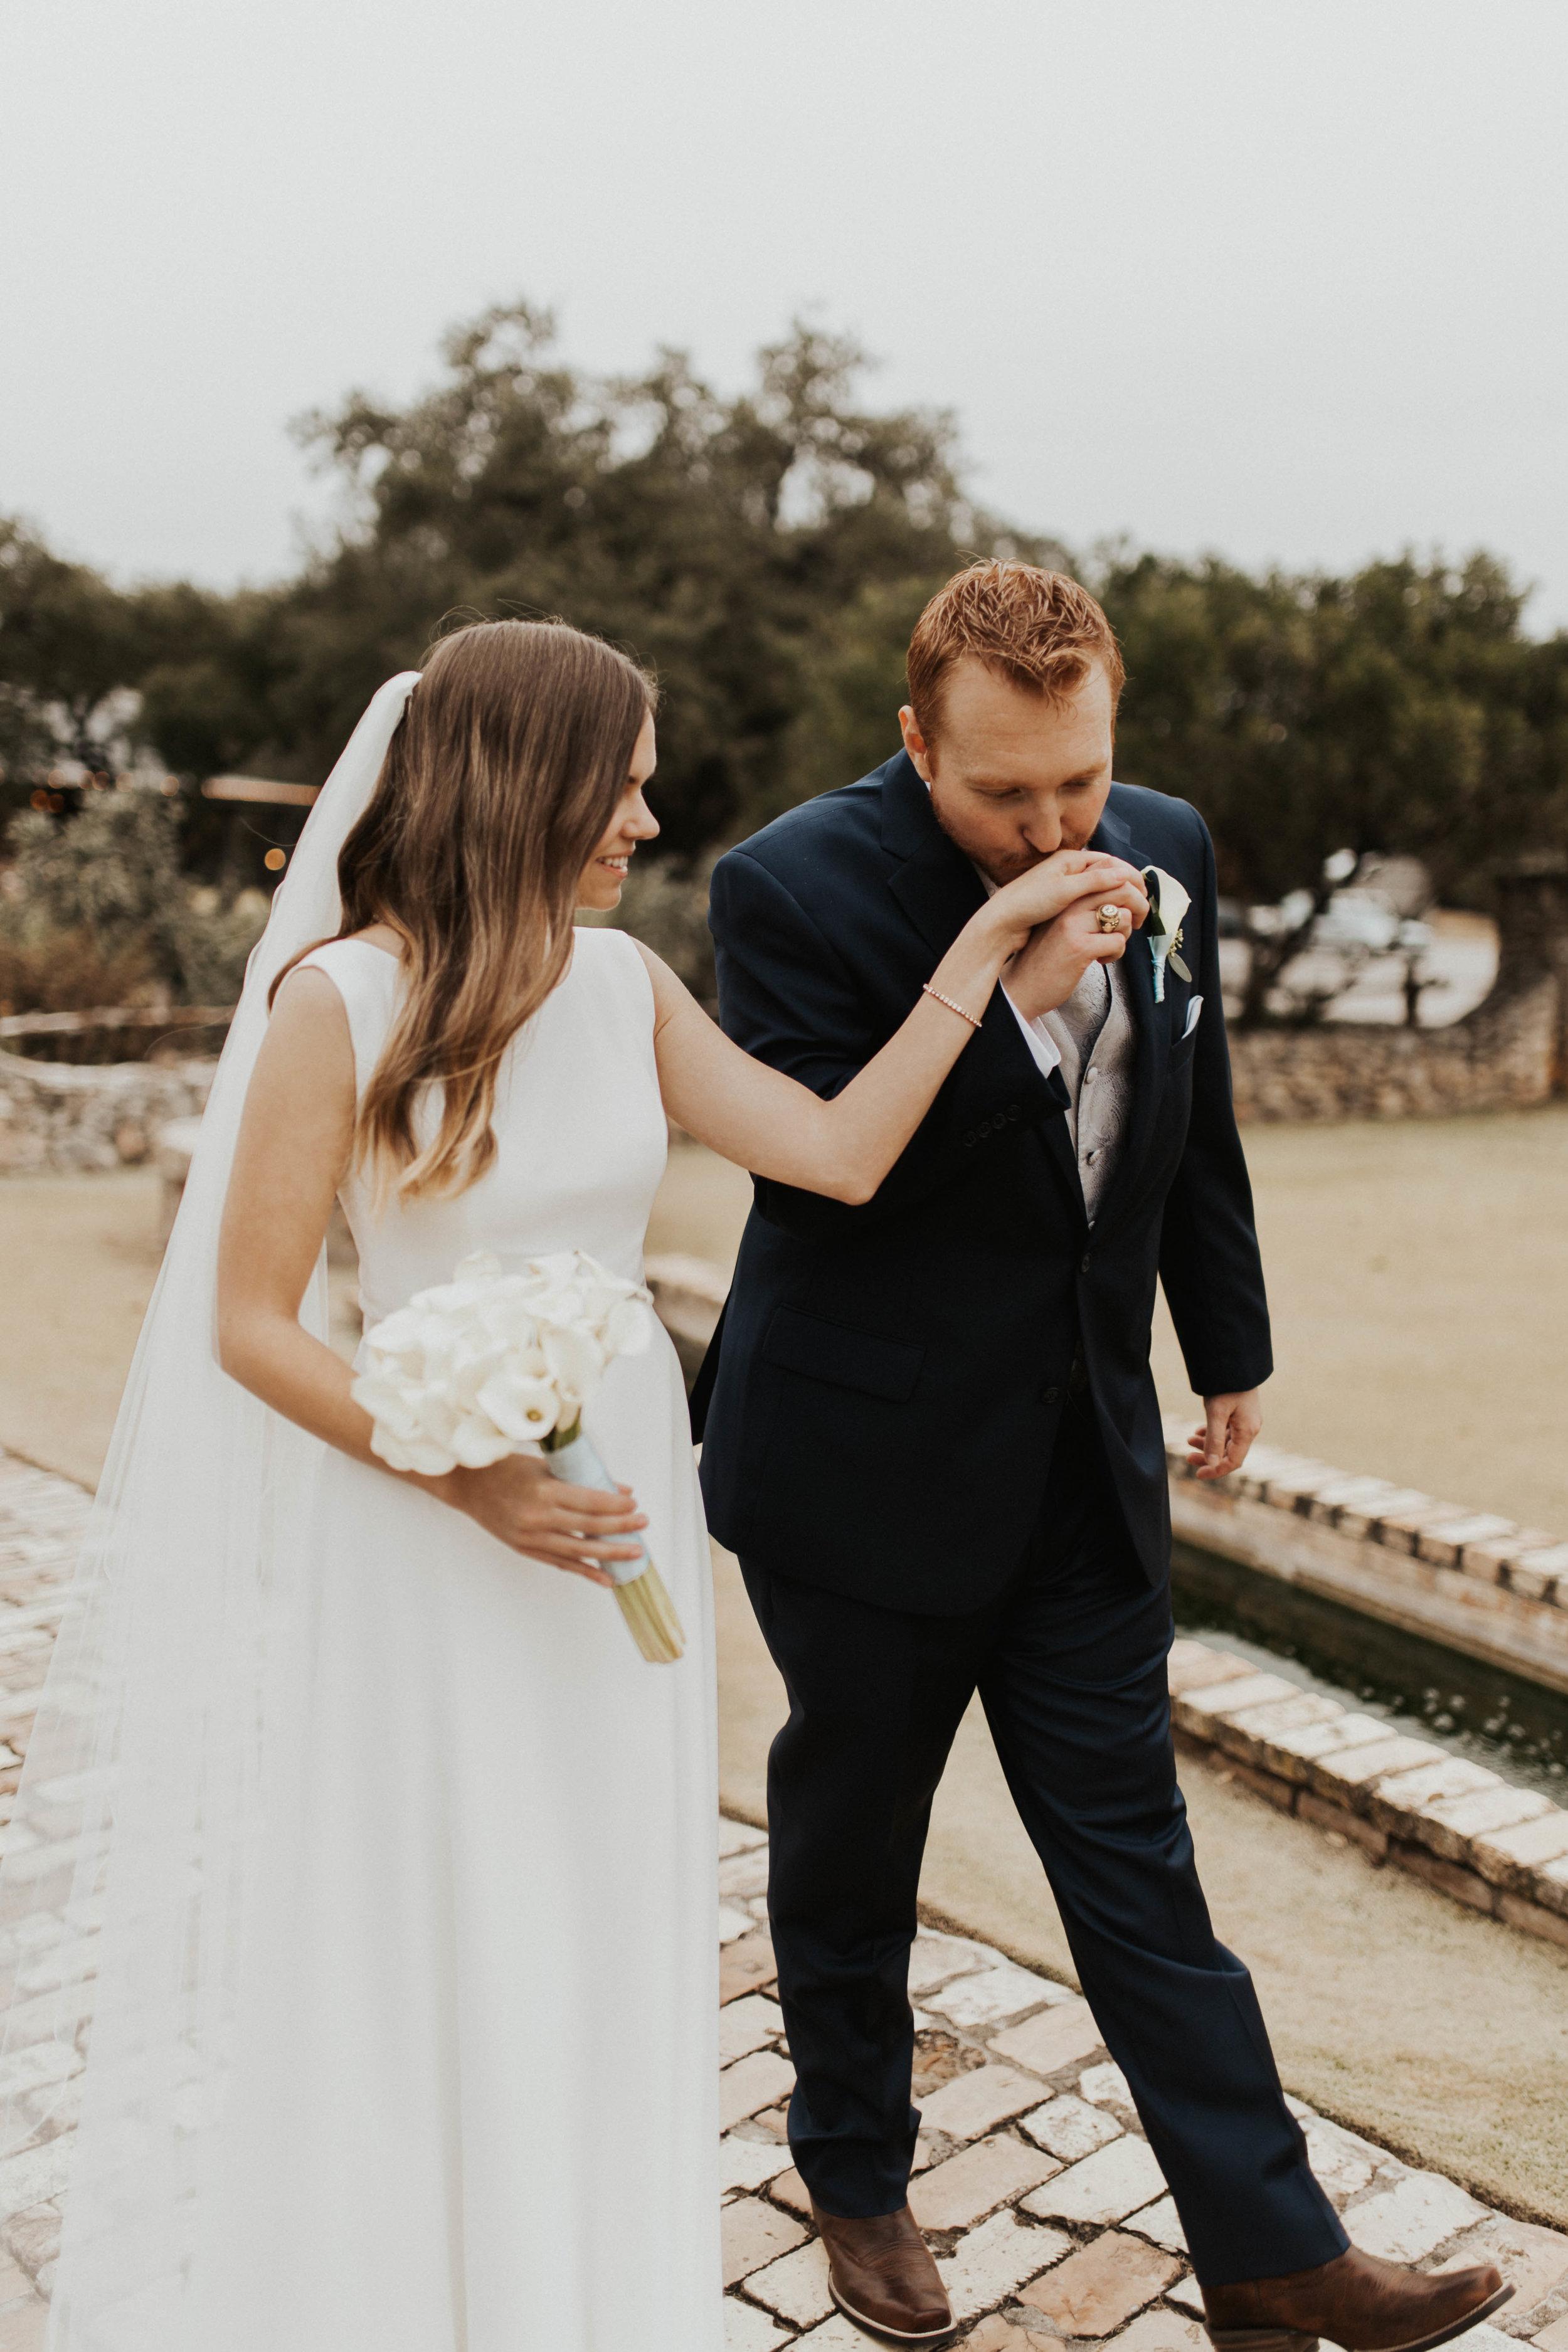 Brad_and_Karoline_Wedding-159.jpg